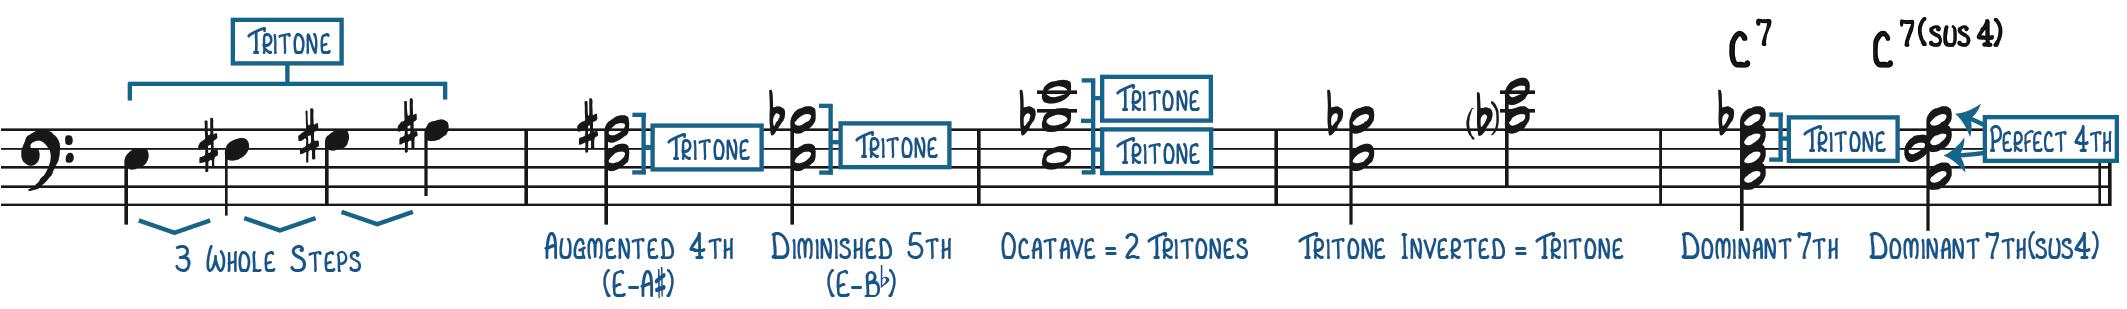 Illustration of Tritone Characteristics